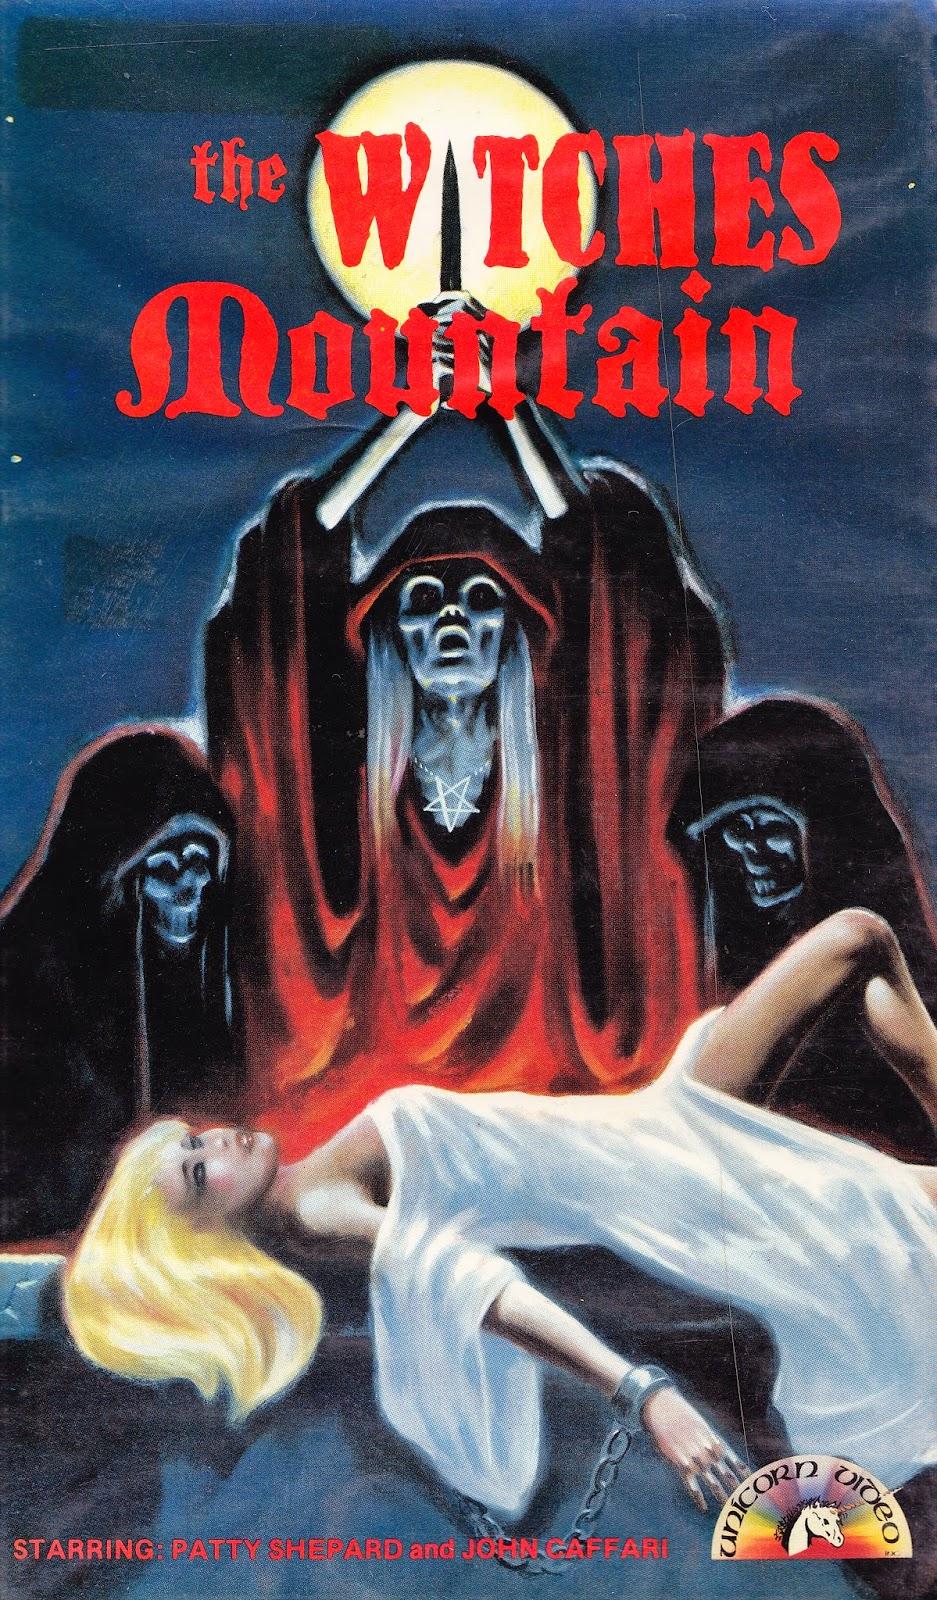 The Witches' Mountain (1972)mrhorrorpedia